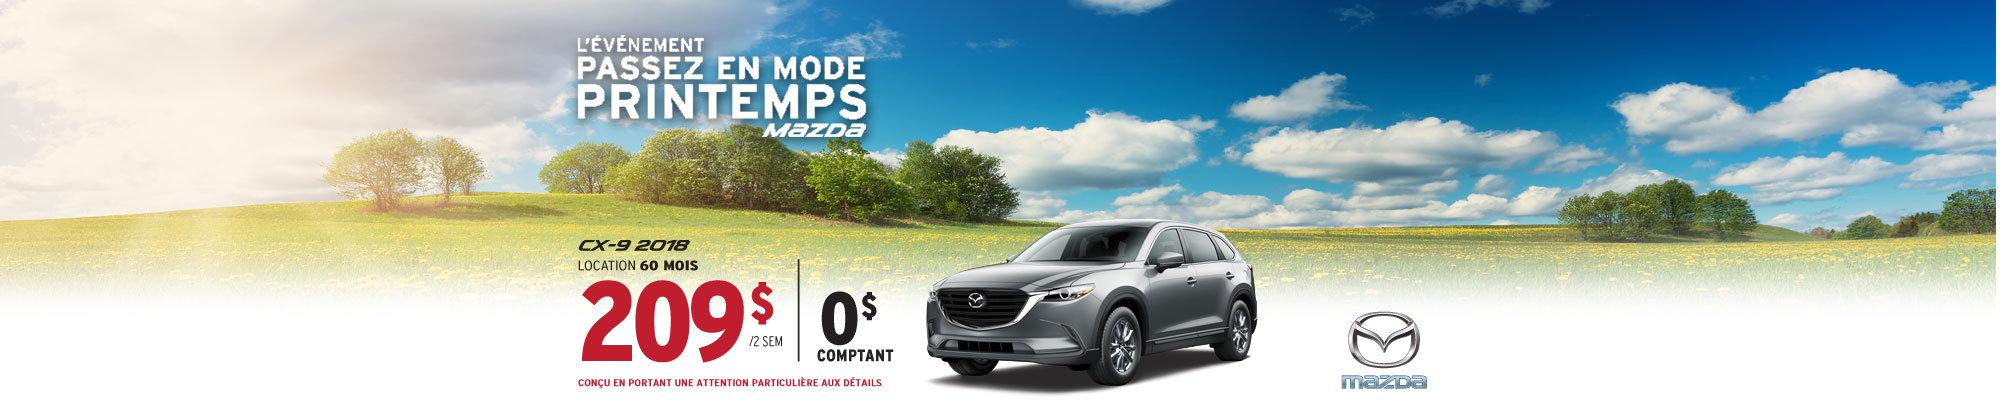 Mazda CX-9 2018 web